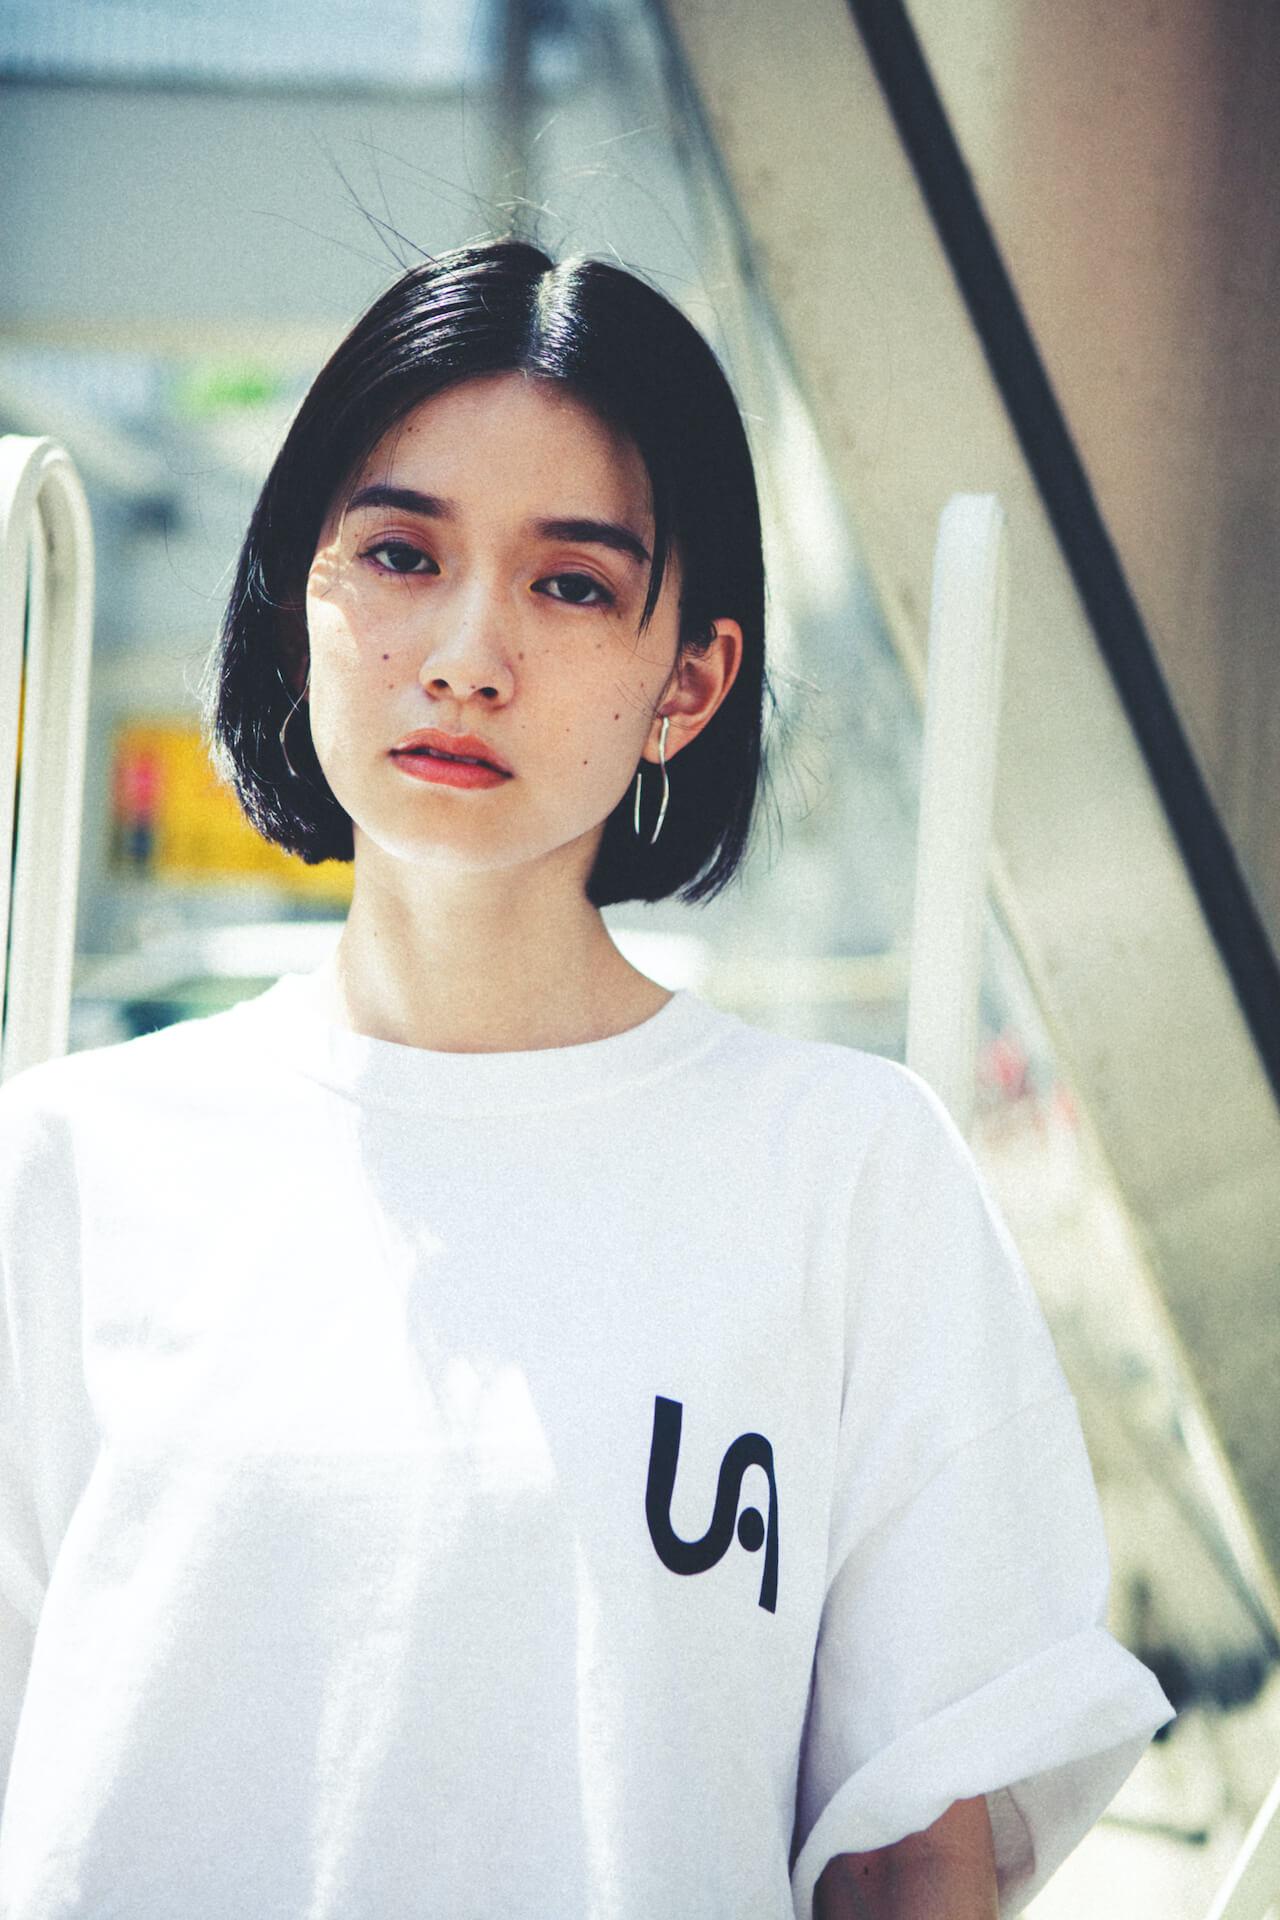 UA × Journal StandardのコラボTシャツが6月25日より店舗販売開始|美衣がモデルを務めるビジュアルも公開に life_fashion210611-ua-journalstandard-6